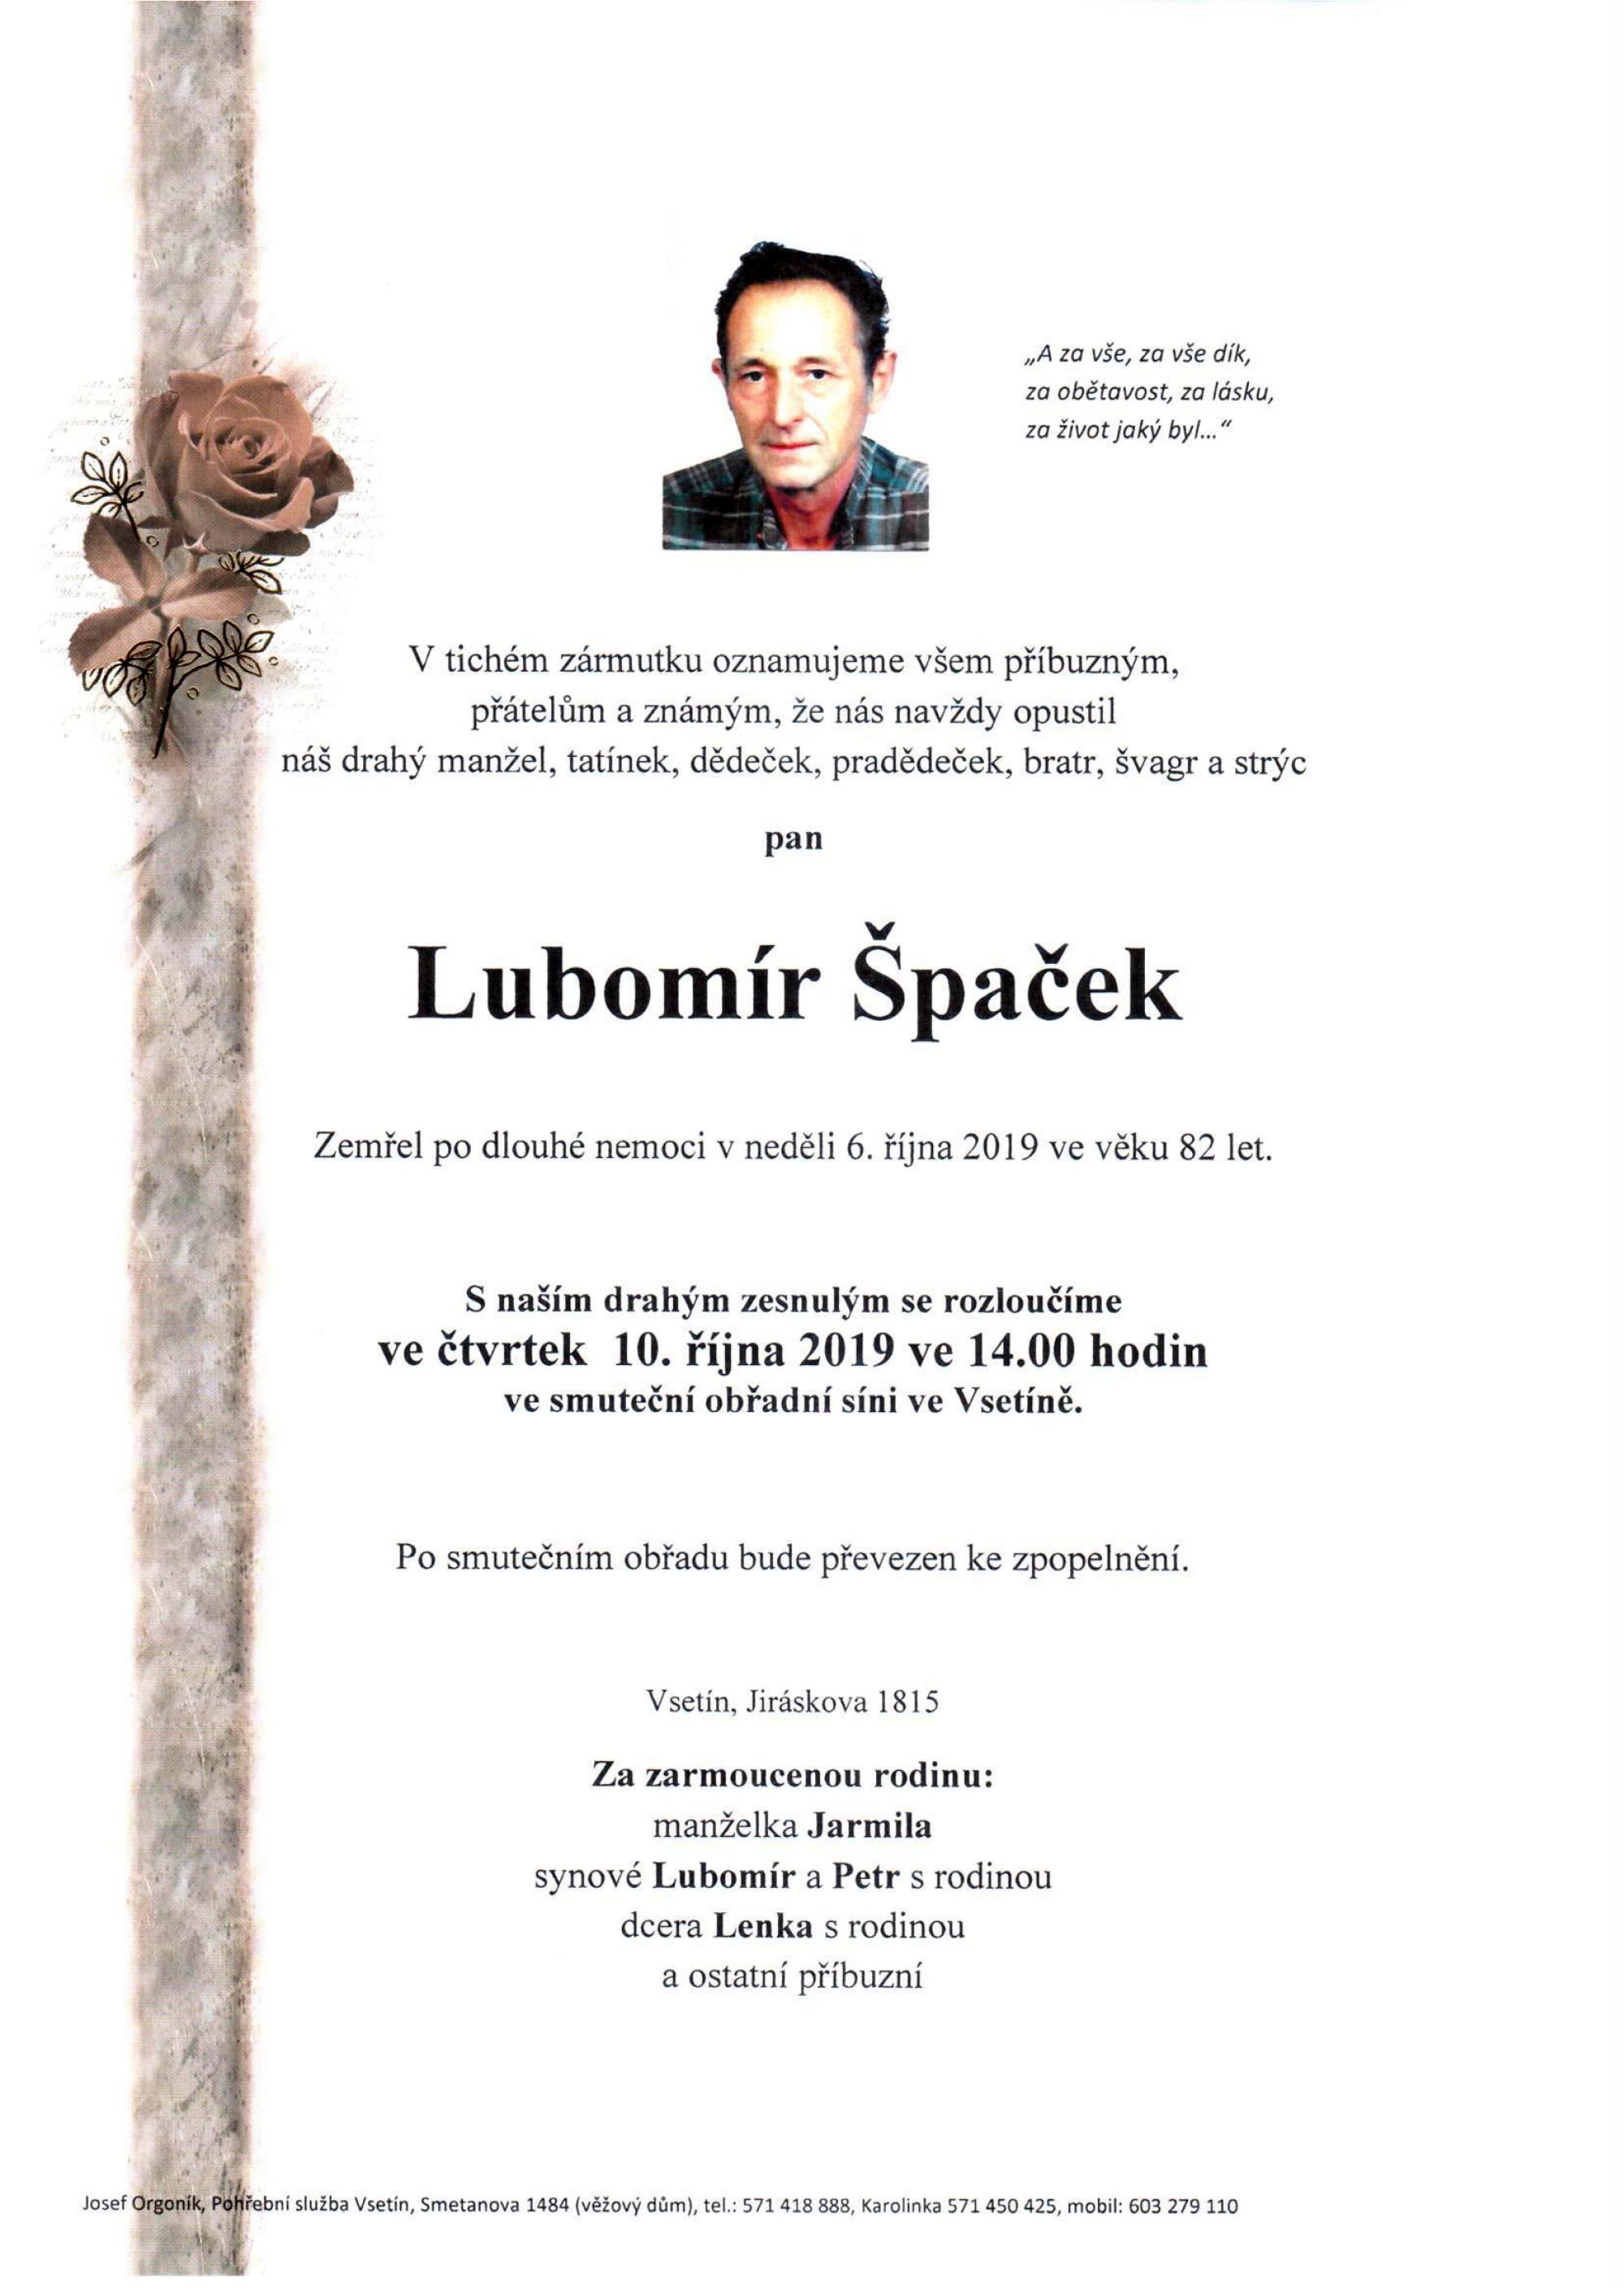 Lubomír Špaček